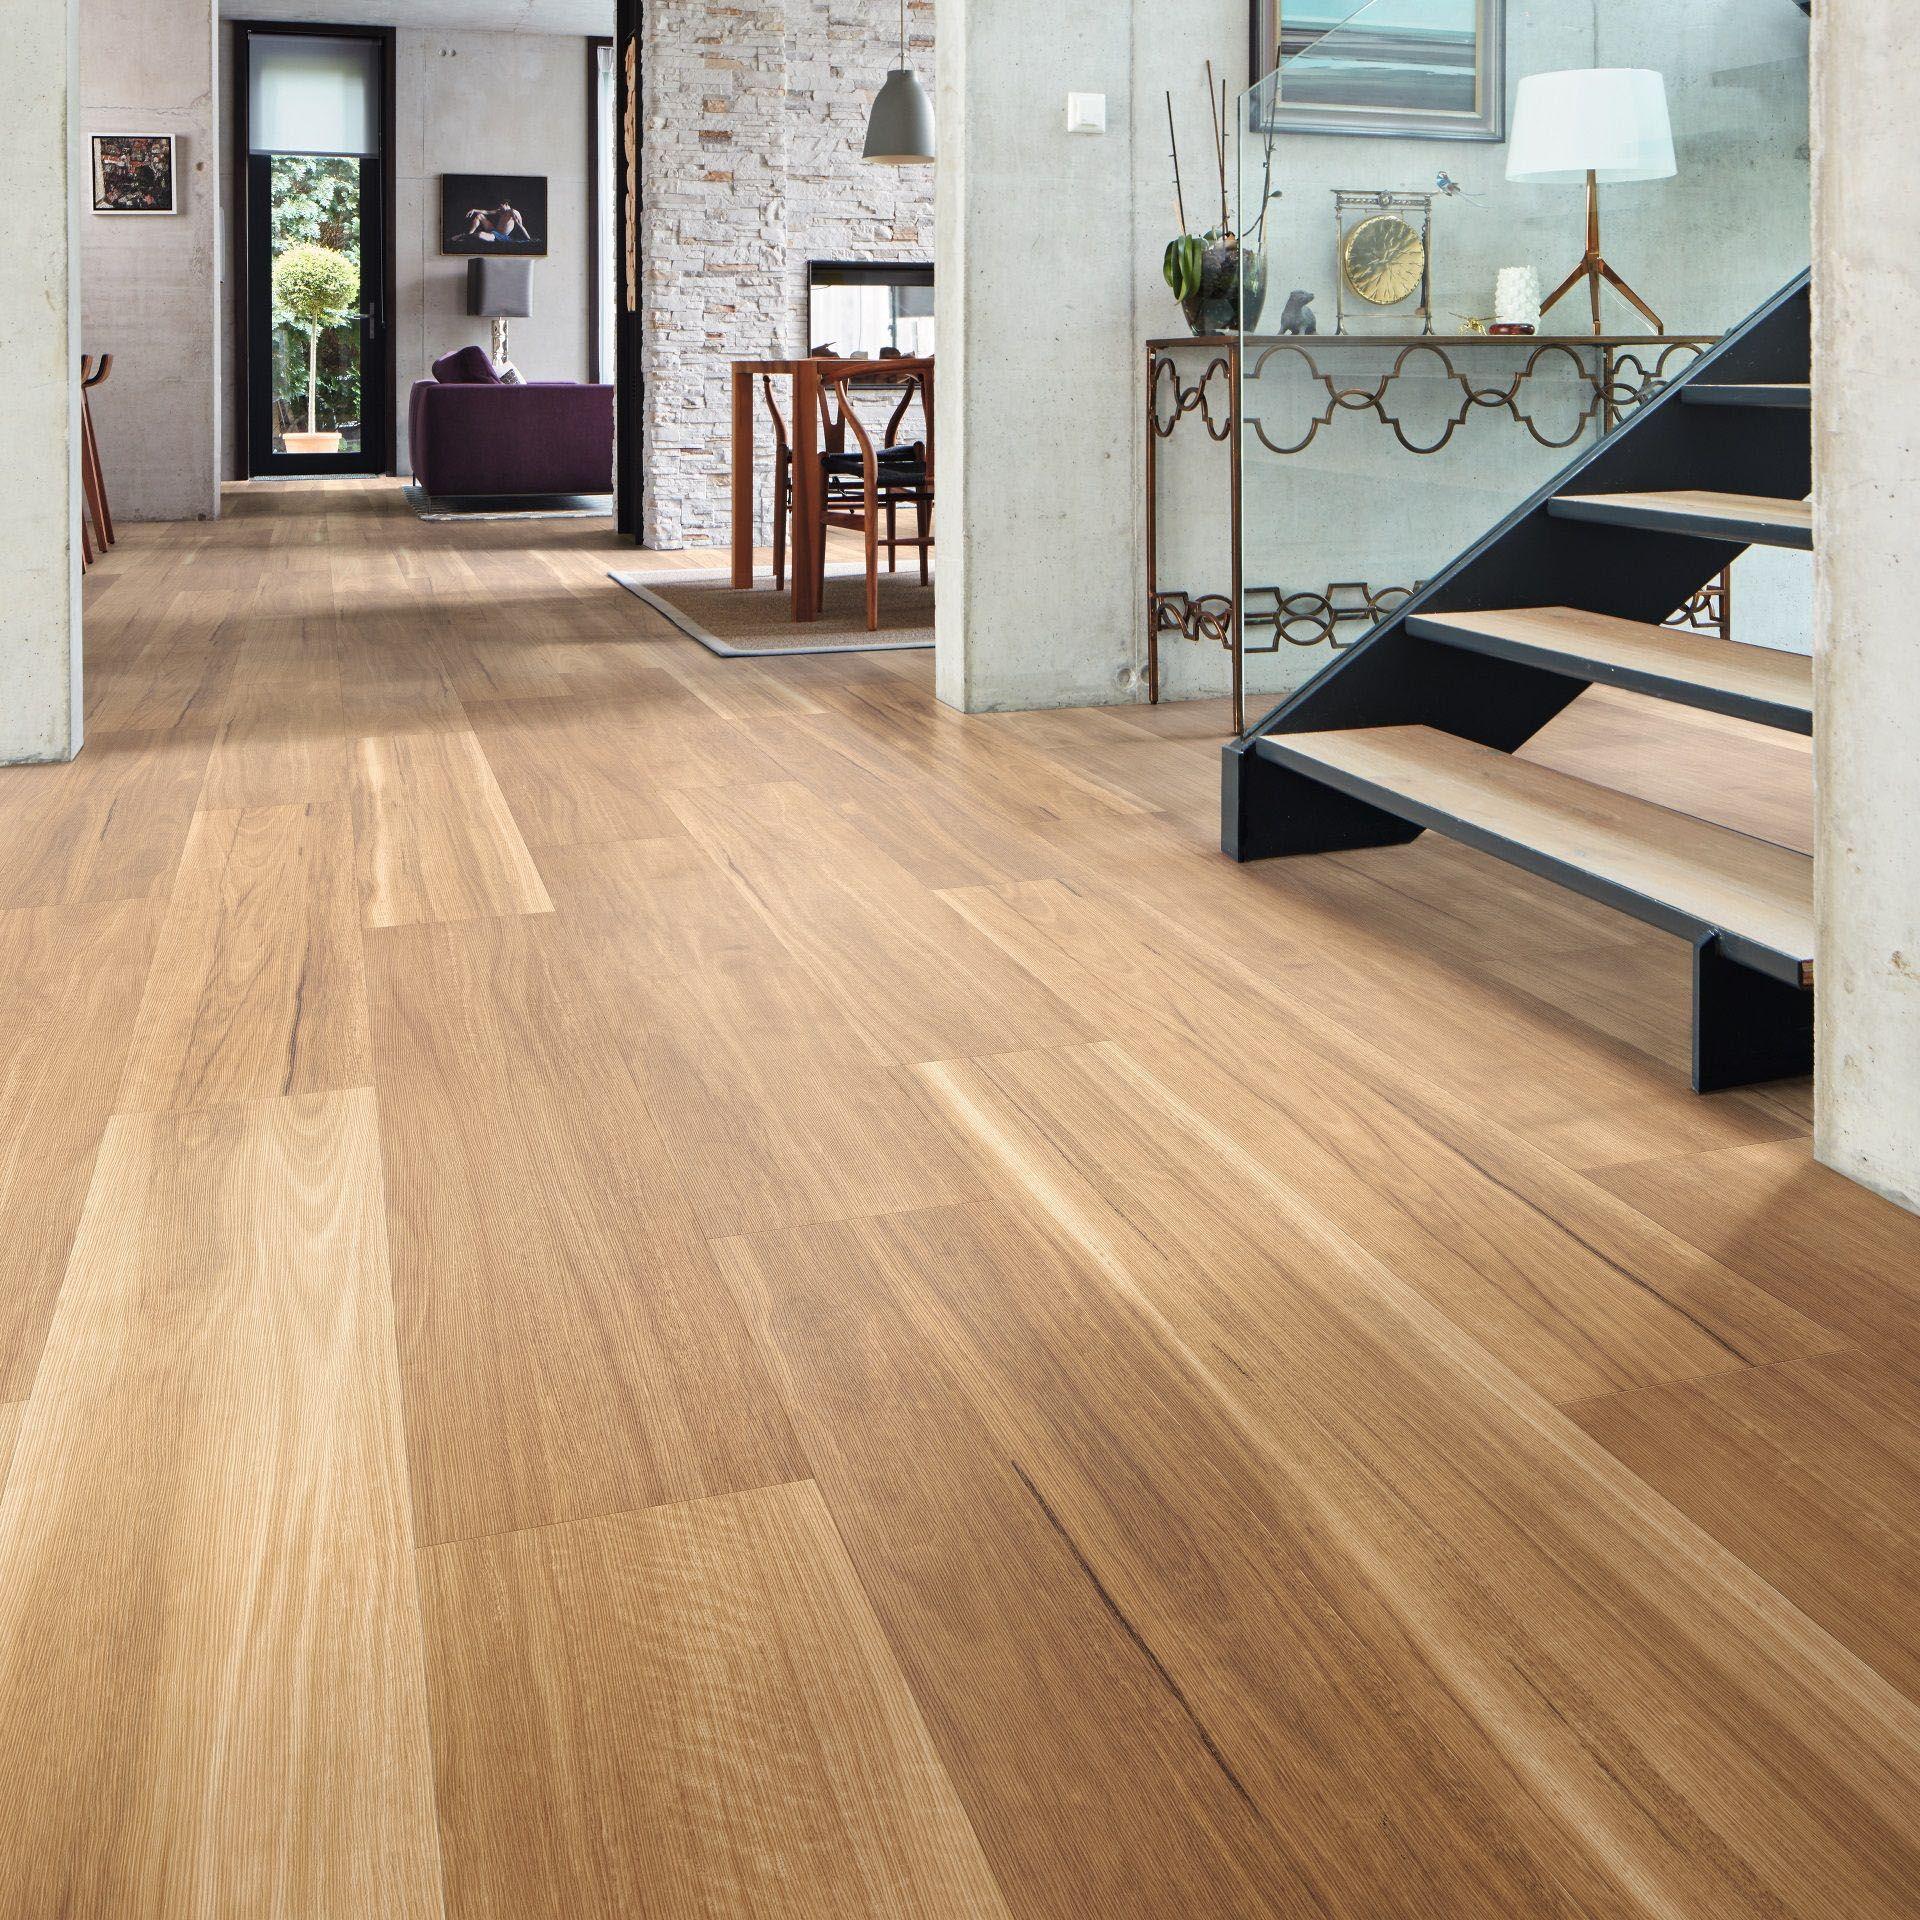 Hardwood Look Tile Floor Covering Assessments, Absolute